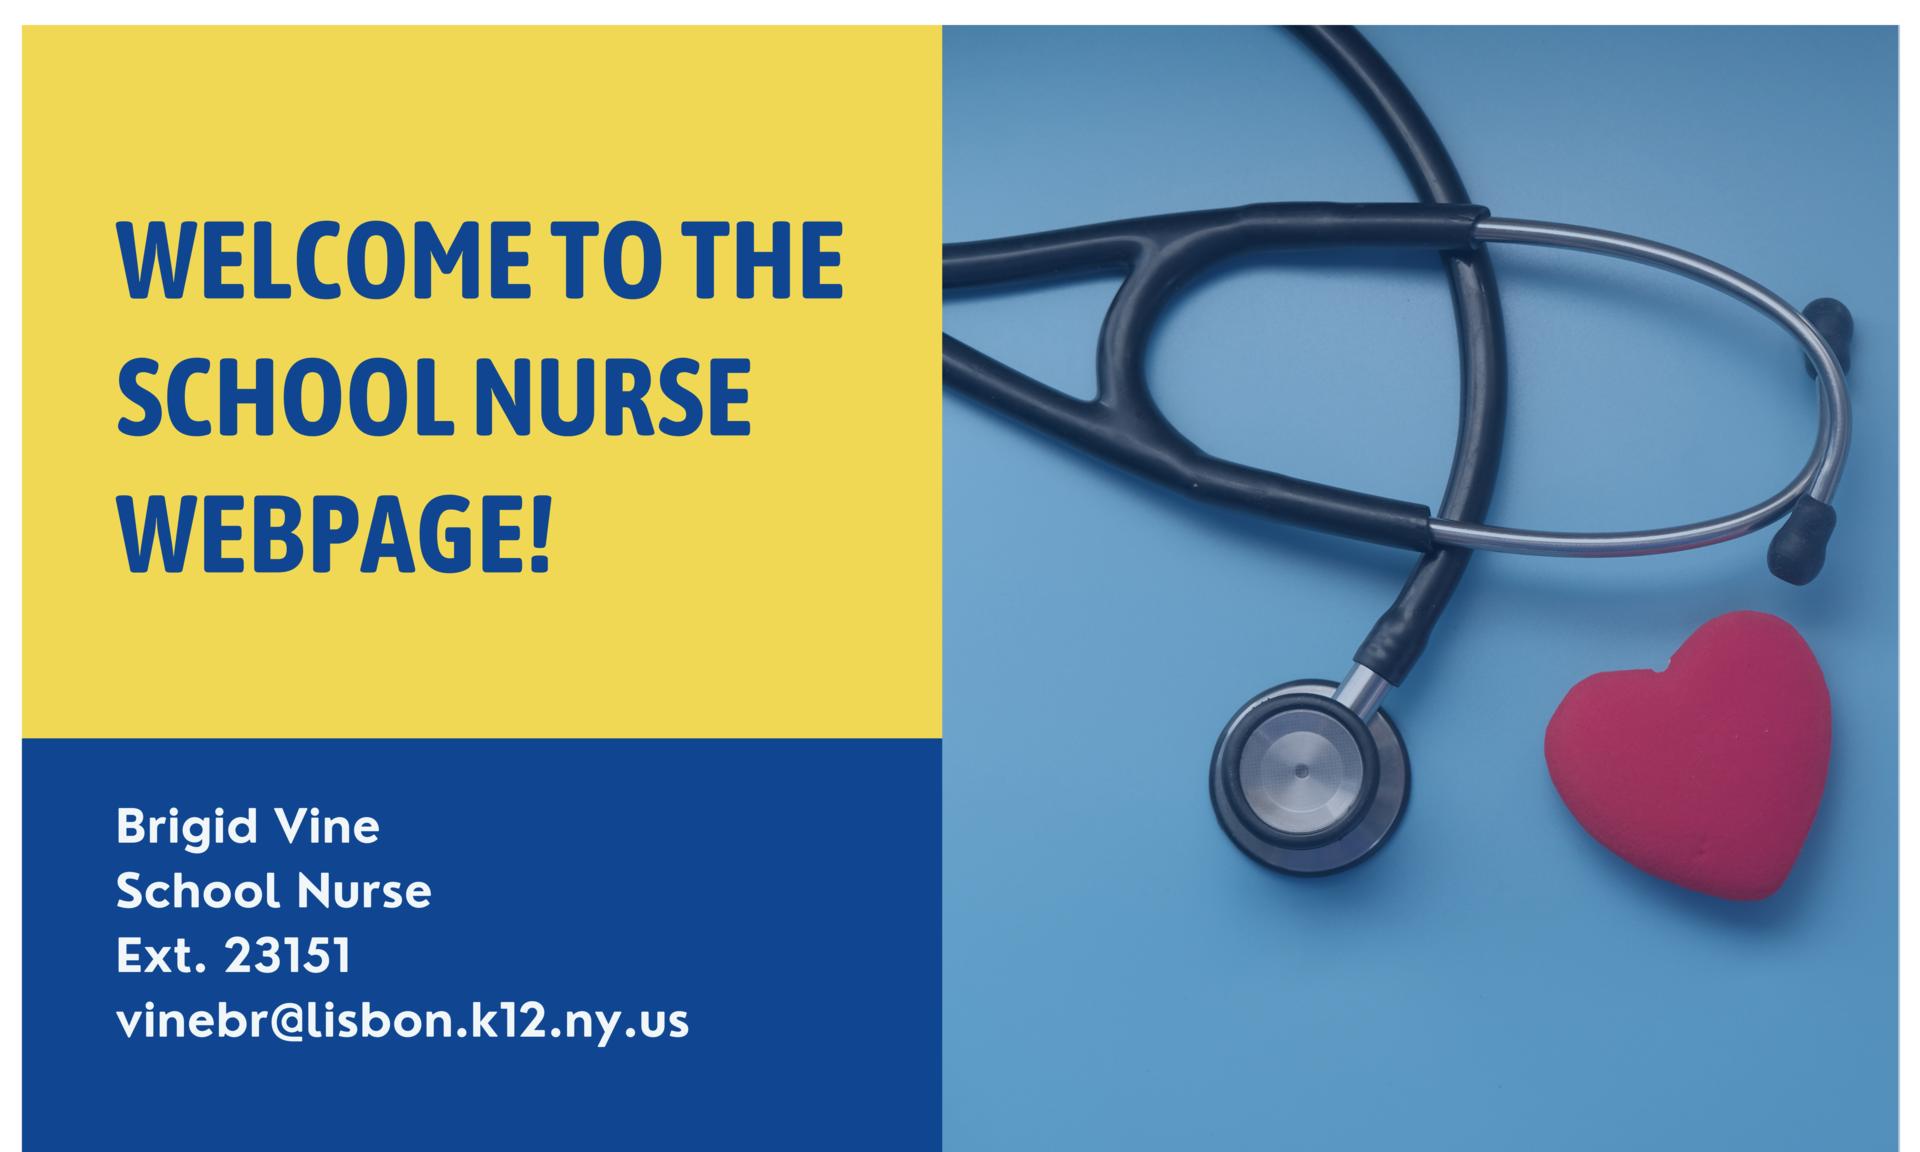 Welcome to the School nurse webpage! Brigid Vine School Nurse Ext. 23151 vinebr@lisbon.k12.ny.us, image of stethoscope with a rubber heart